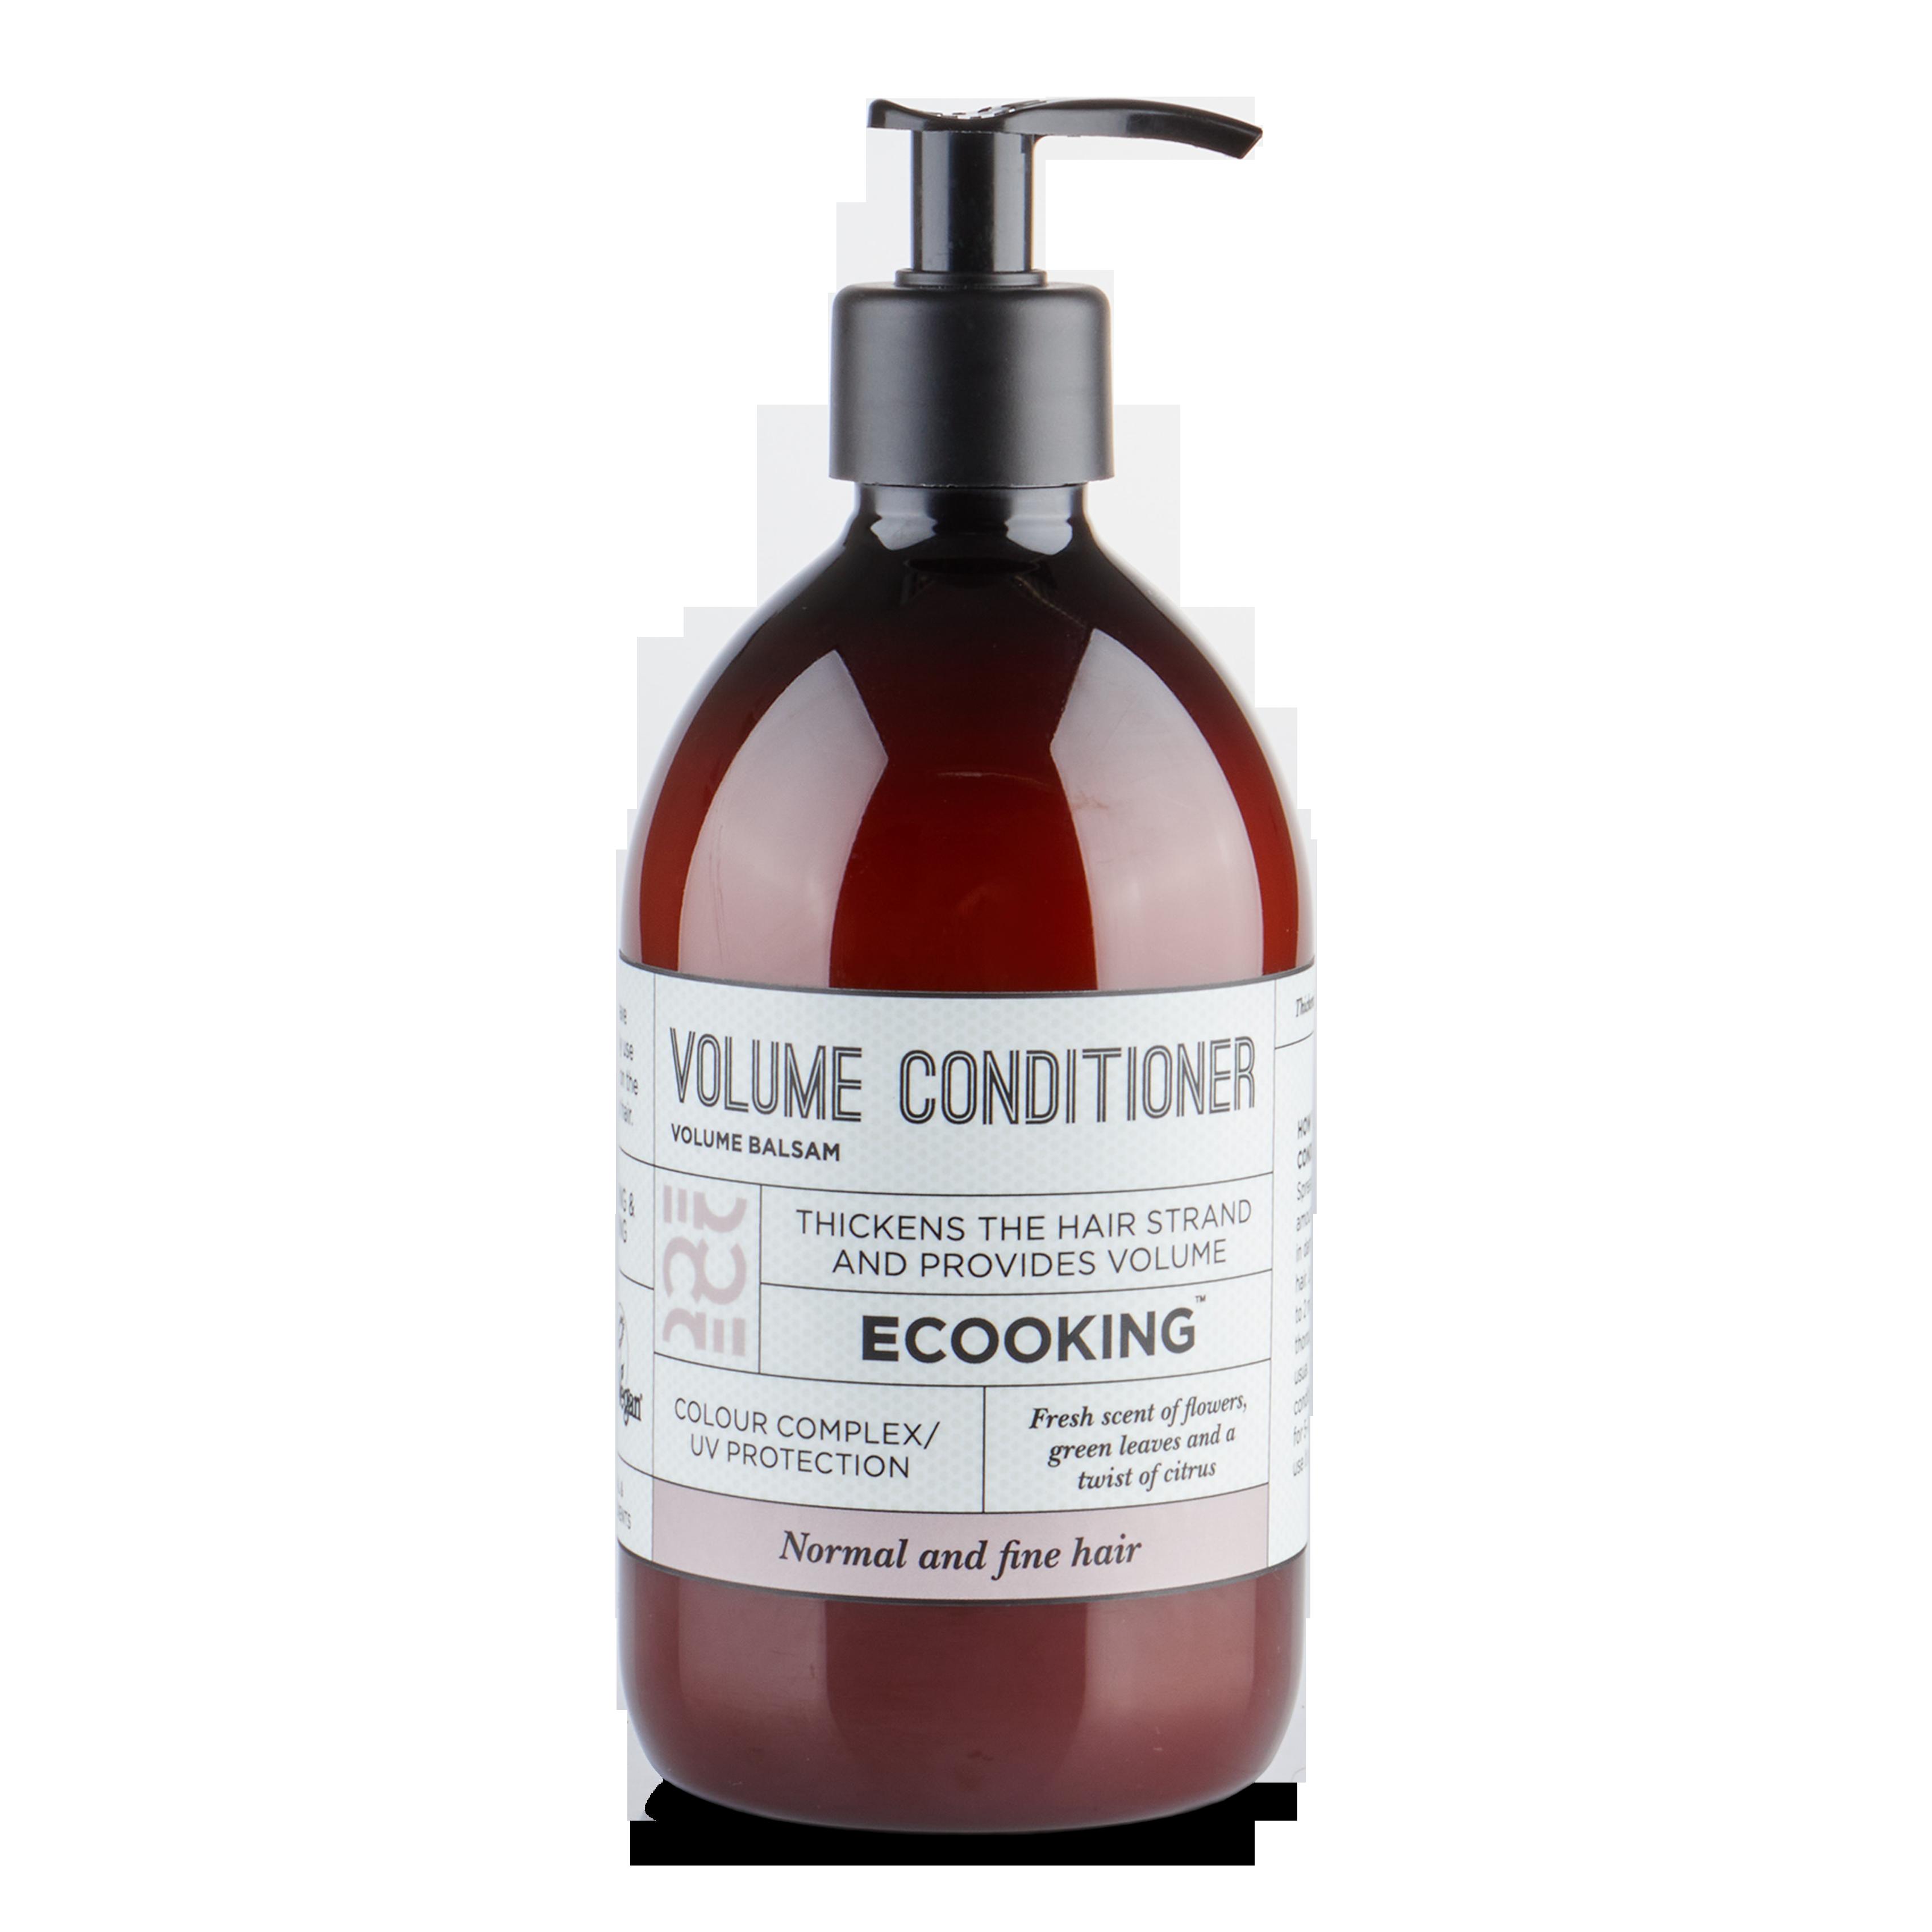 Ecooking - Volume Conditioner 500 ml